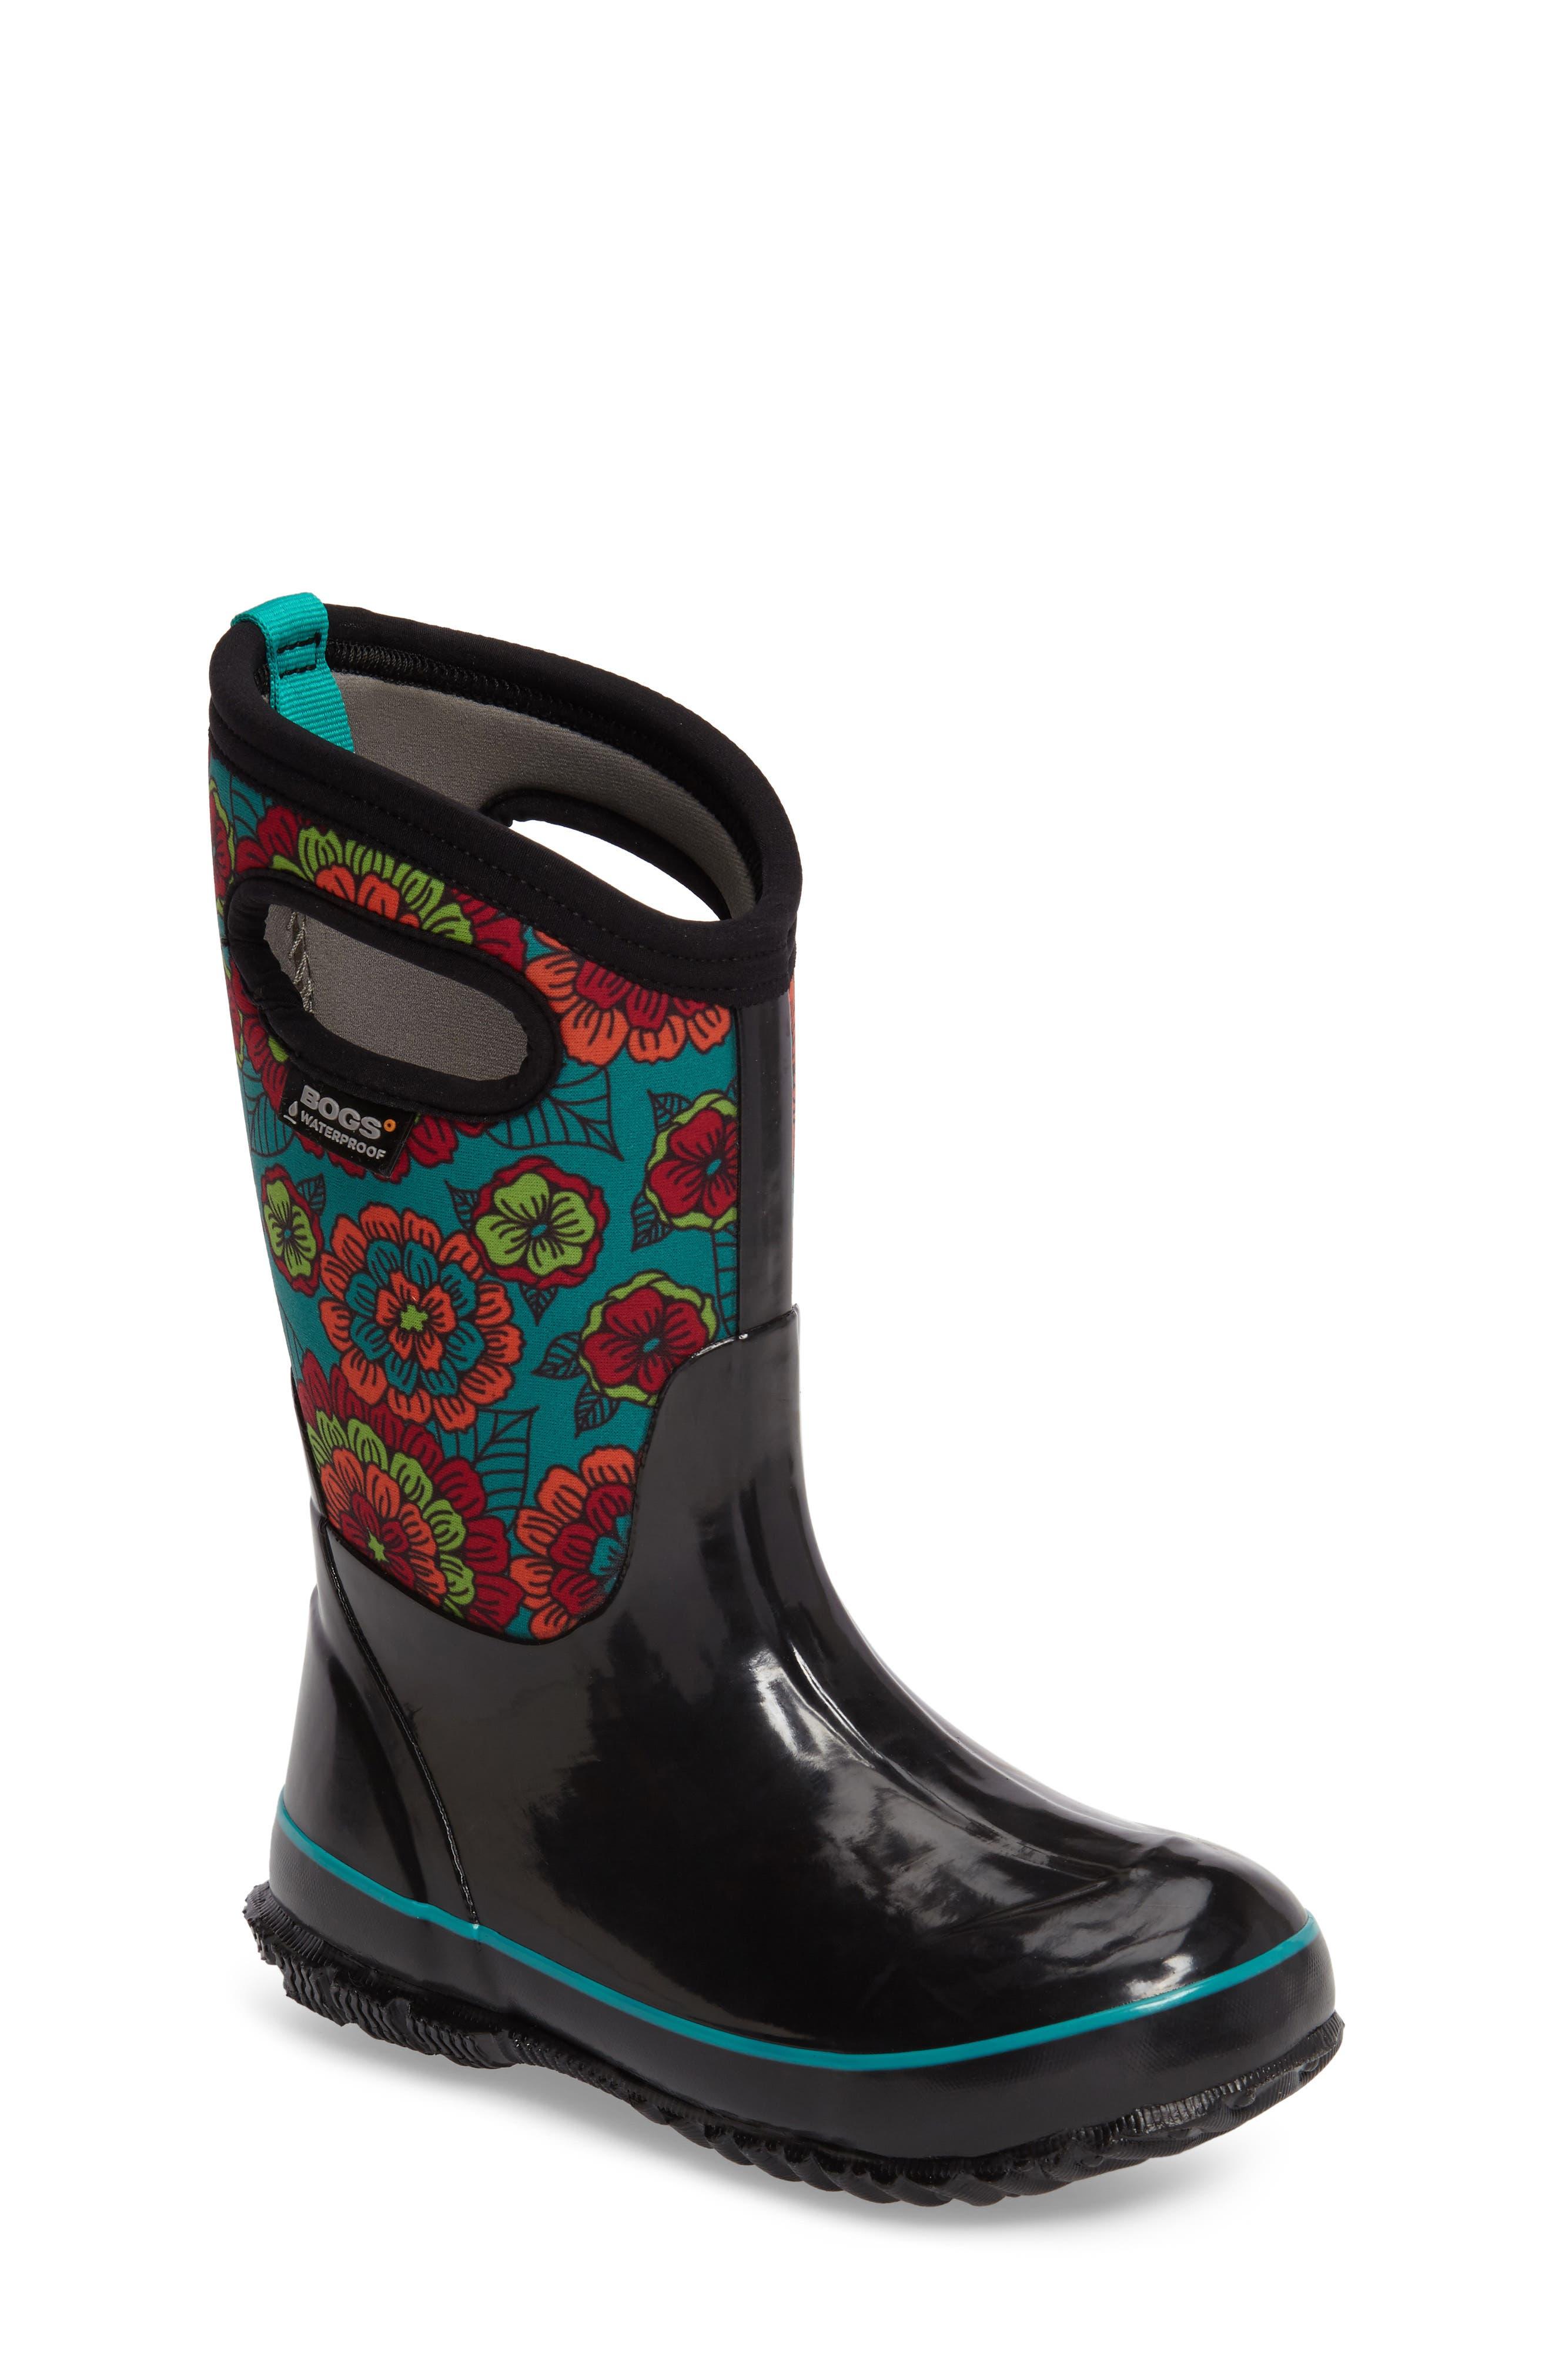 Classic Pansies Insulated Waterproof Rain Boot,                         Main,                         color, BLACK MULTI